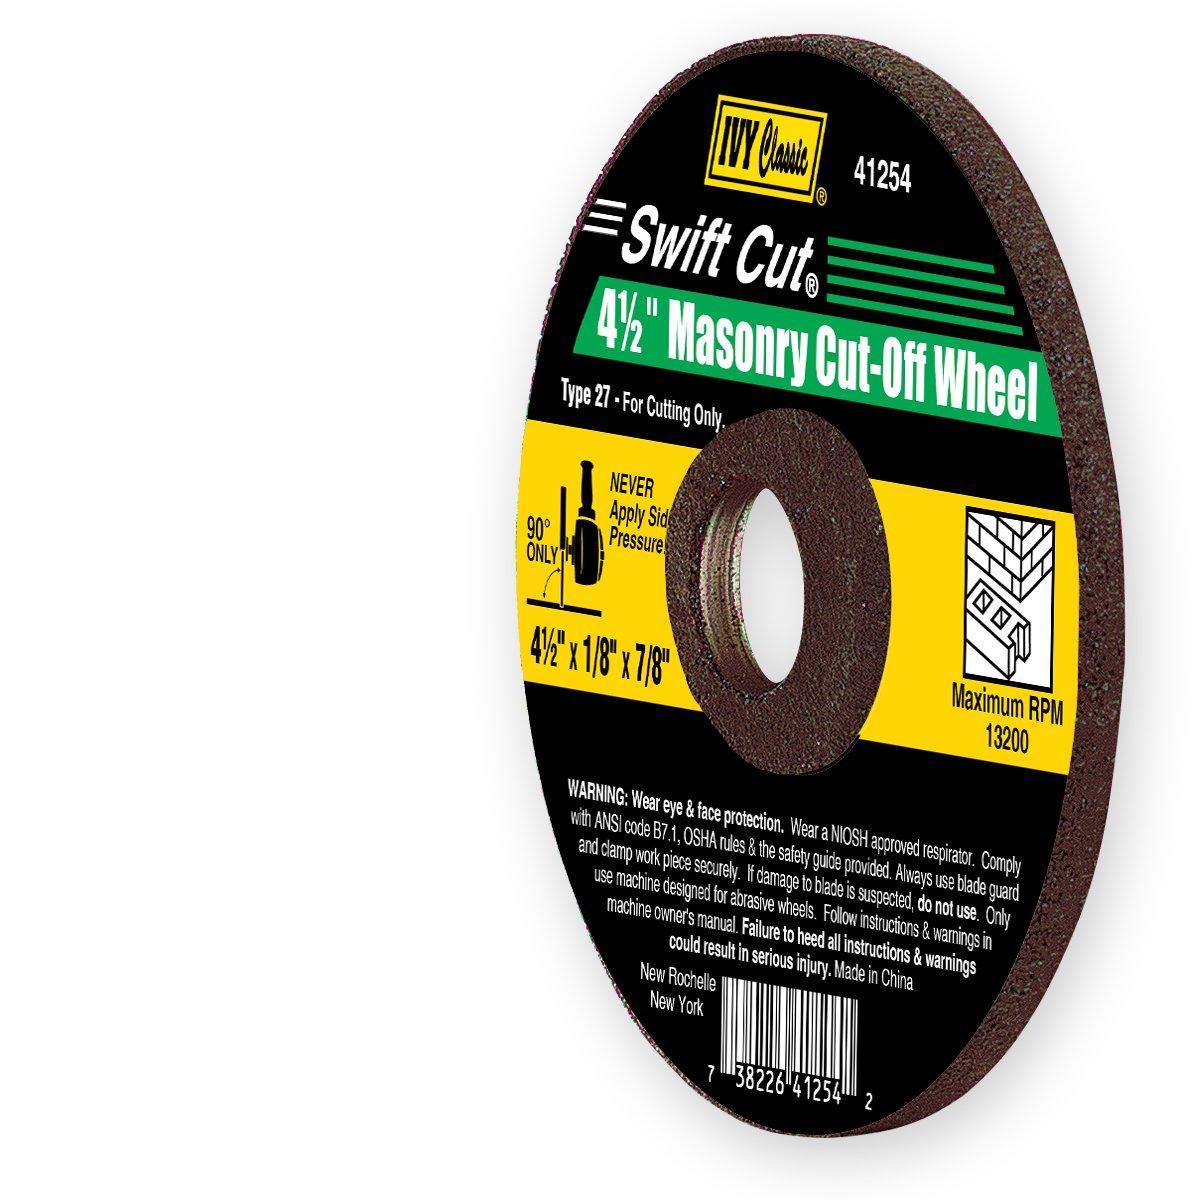 IVY Classic 41254 Swift Cut 4-1//2-Inch x 1//8-Inch x 7//8-Inch Arbor 1-Piece Masonry Depressed Center Wheel for Grinders